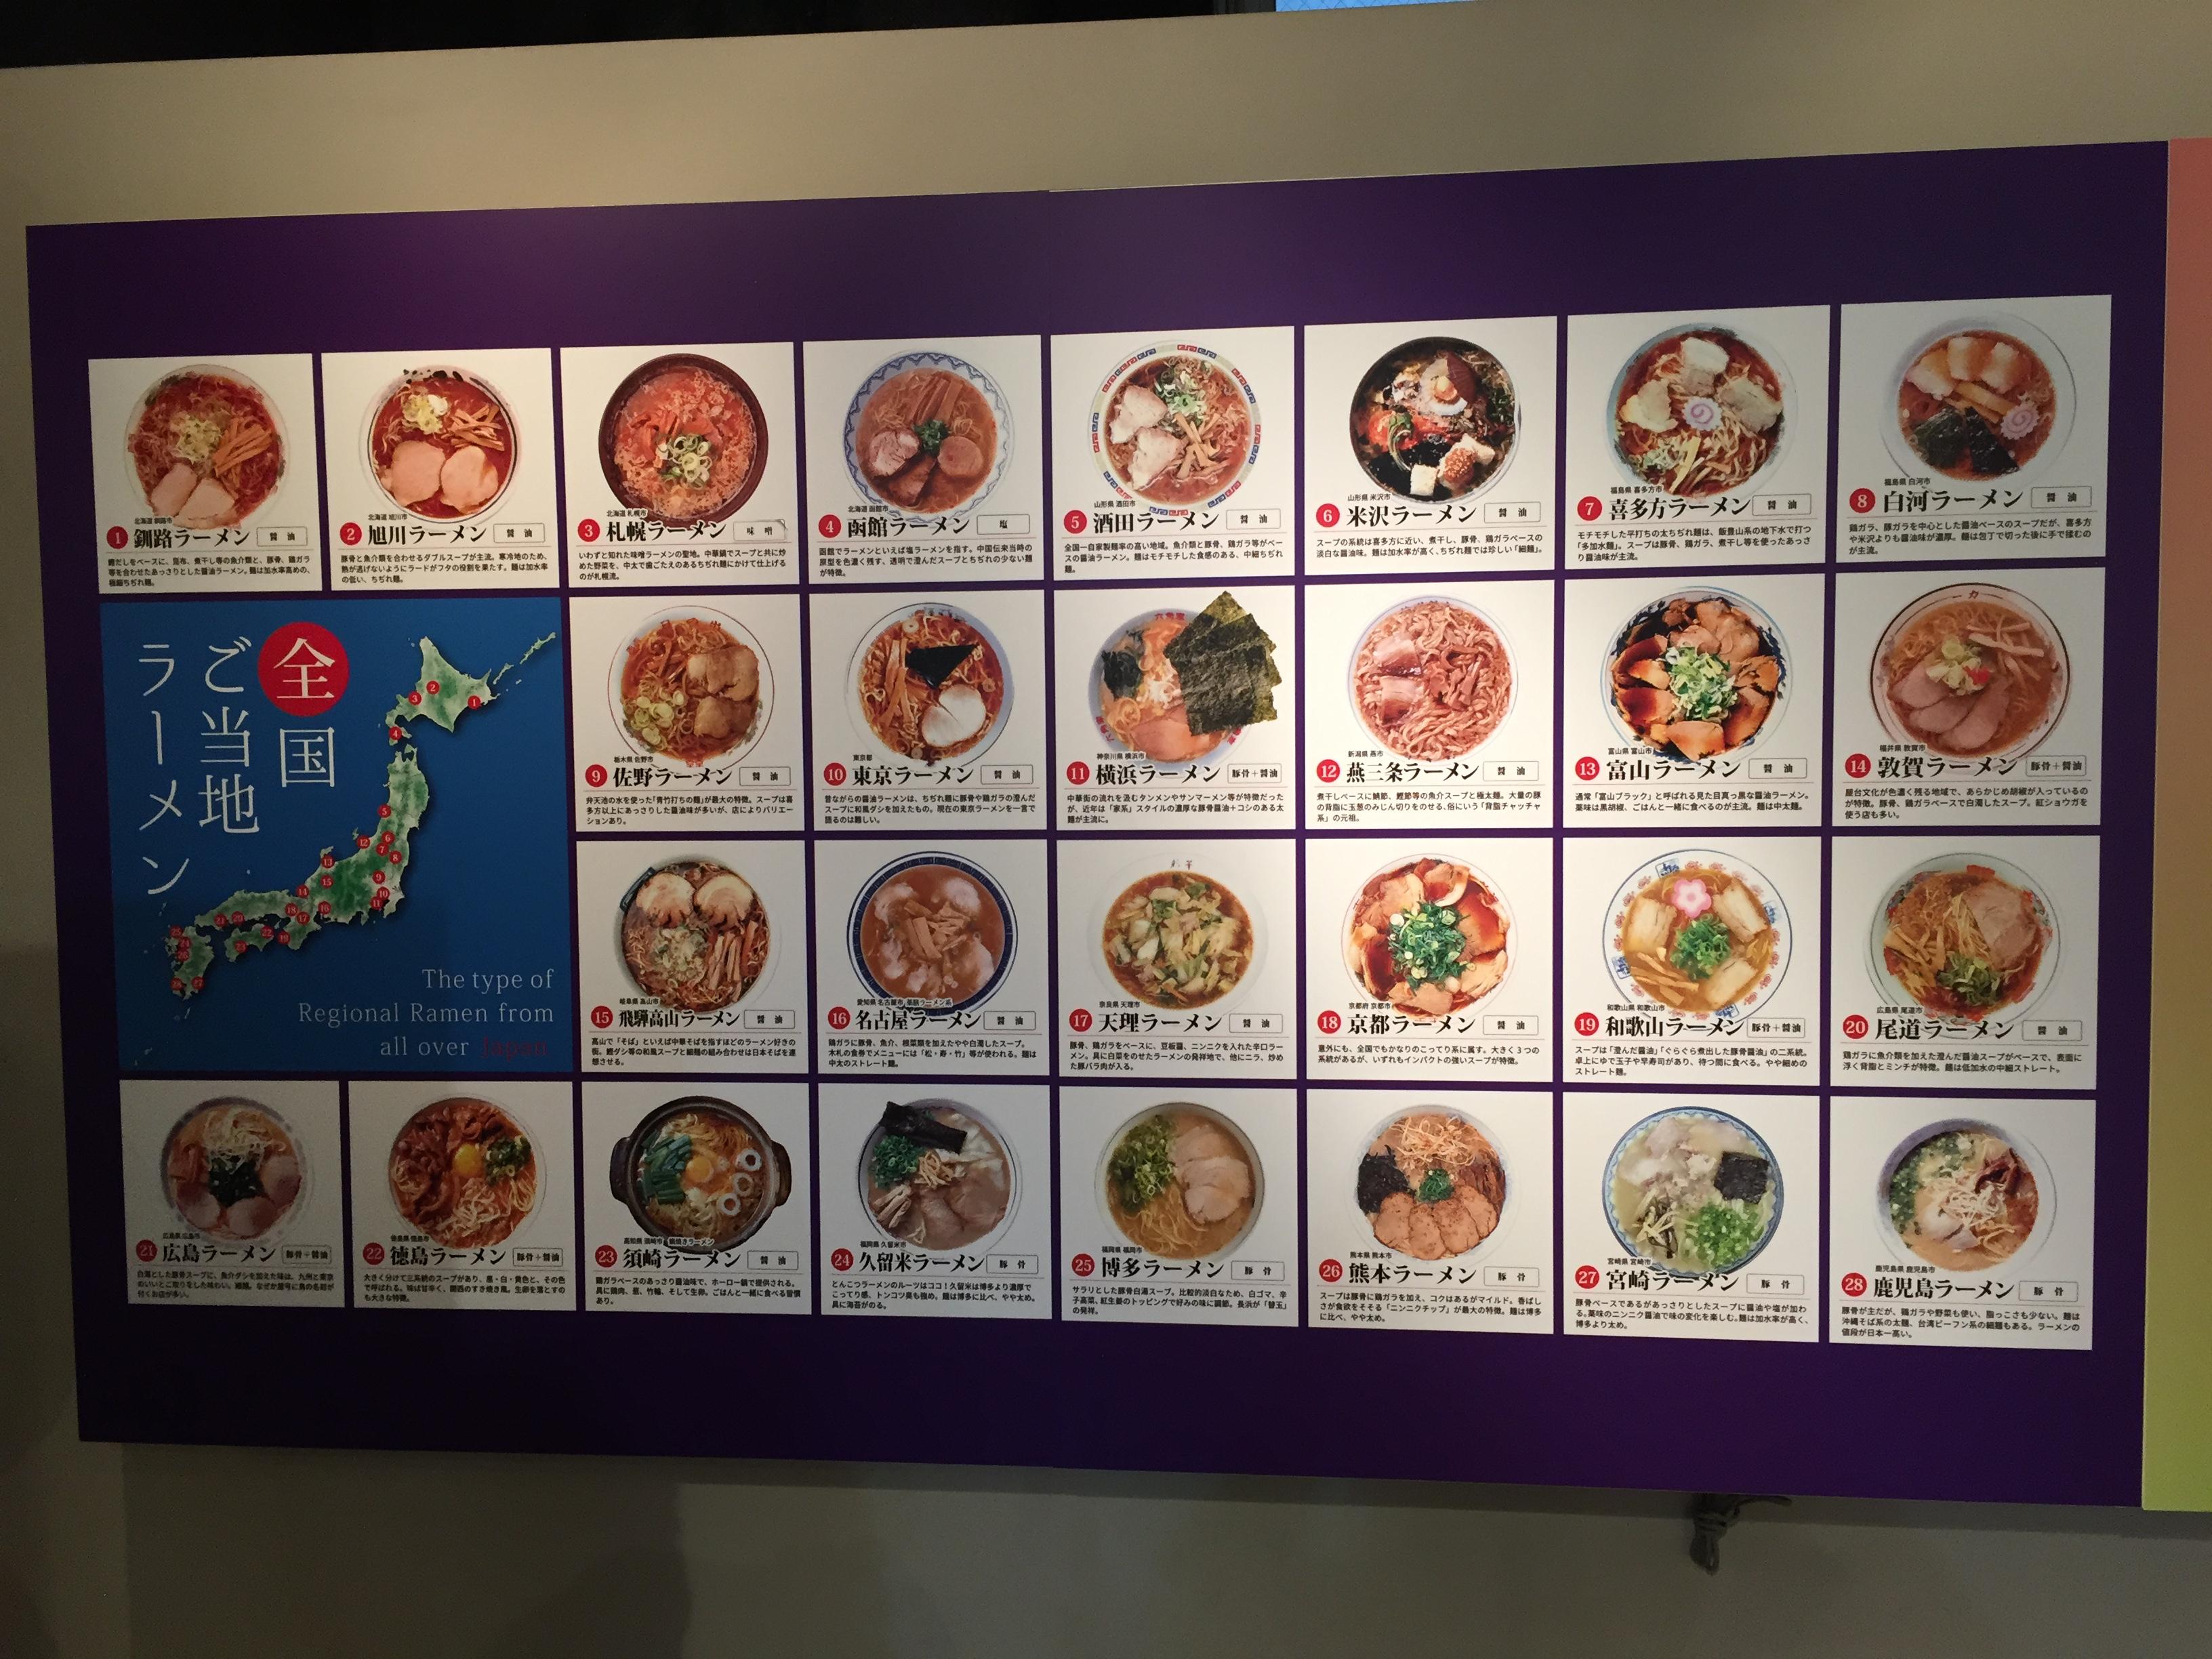 ramen by region,  Shinyokahama ramen museum